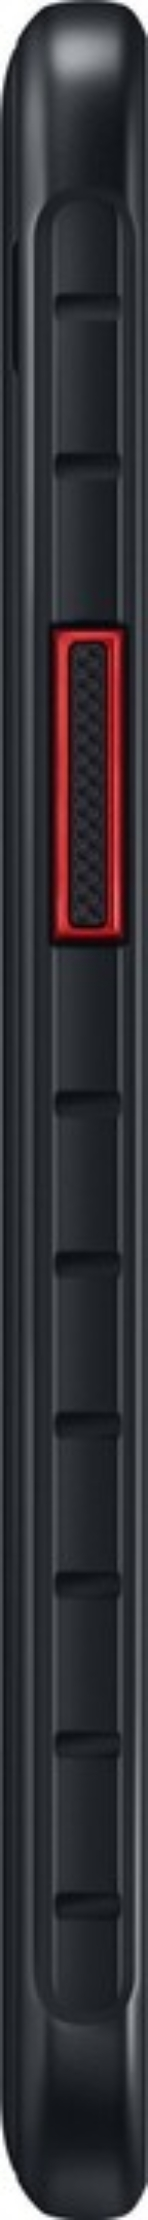 Samsung Galaxy Xcover 5 render leak 3